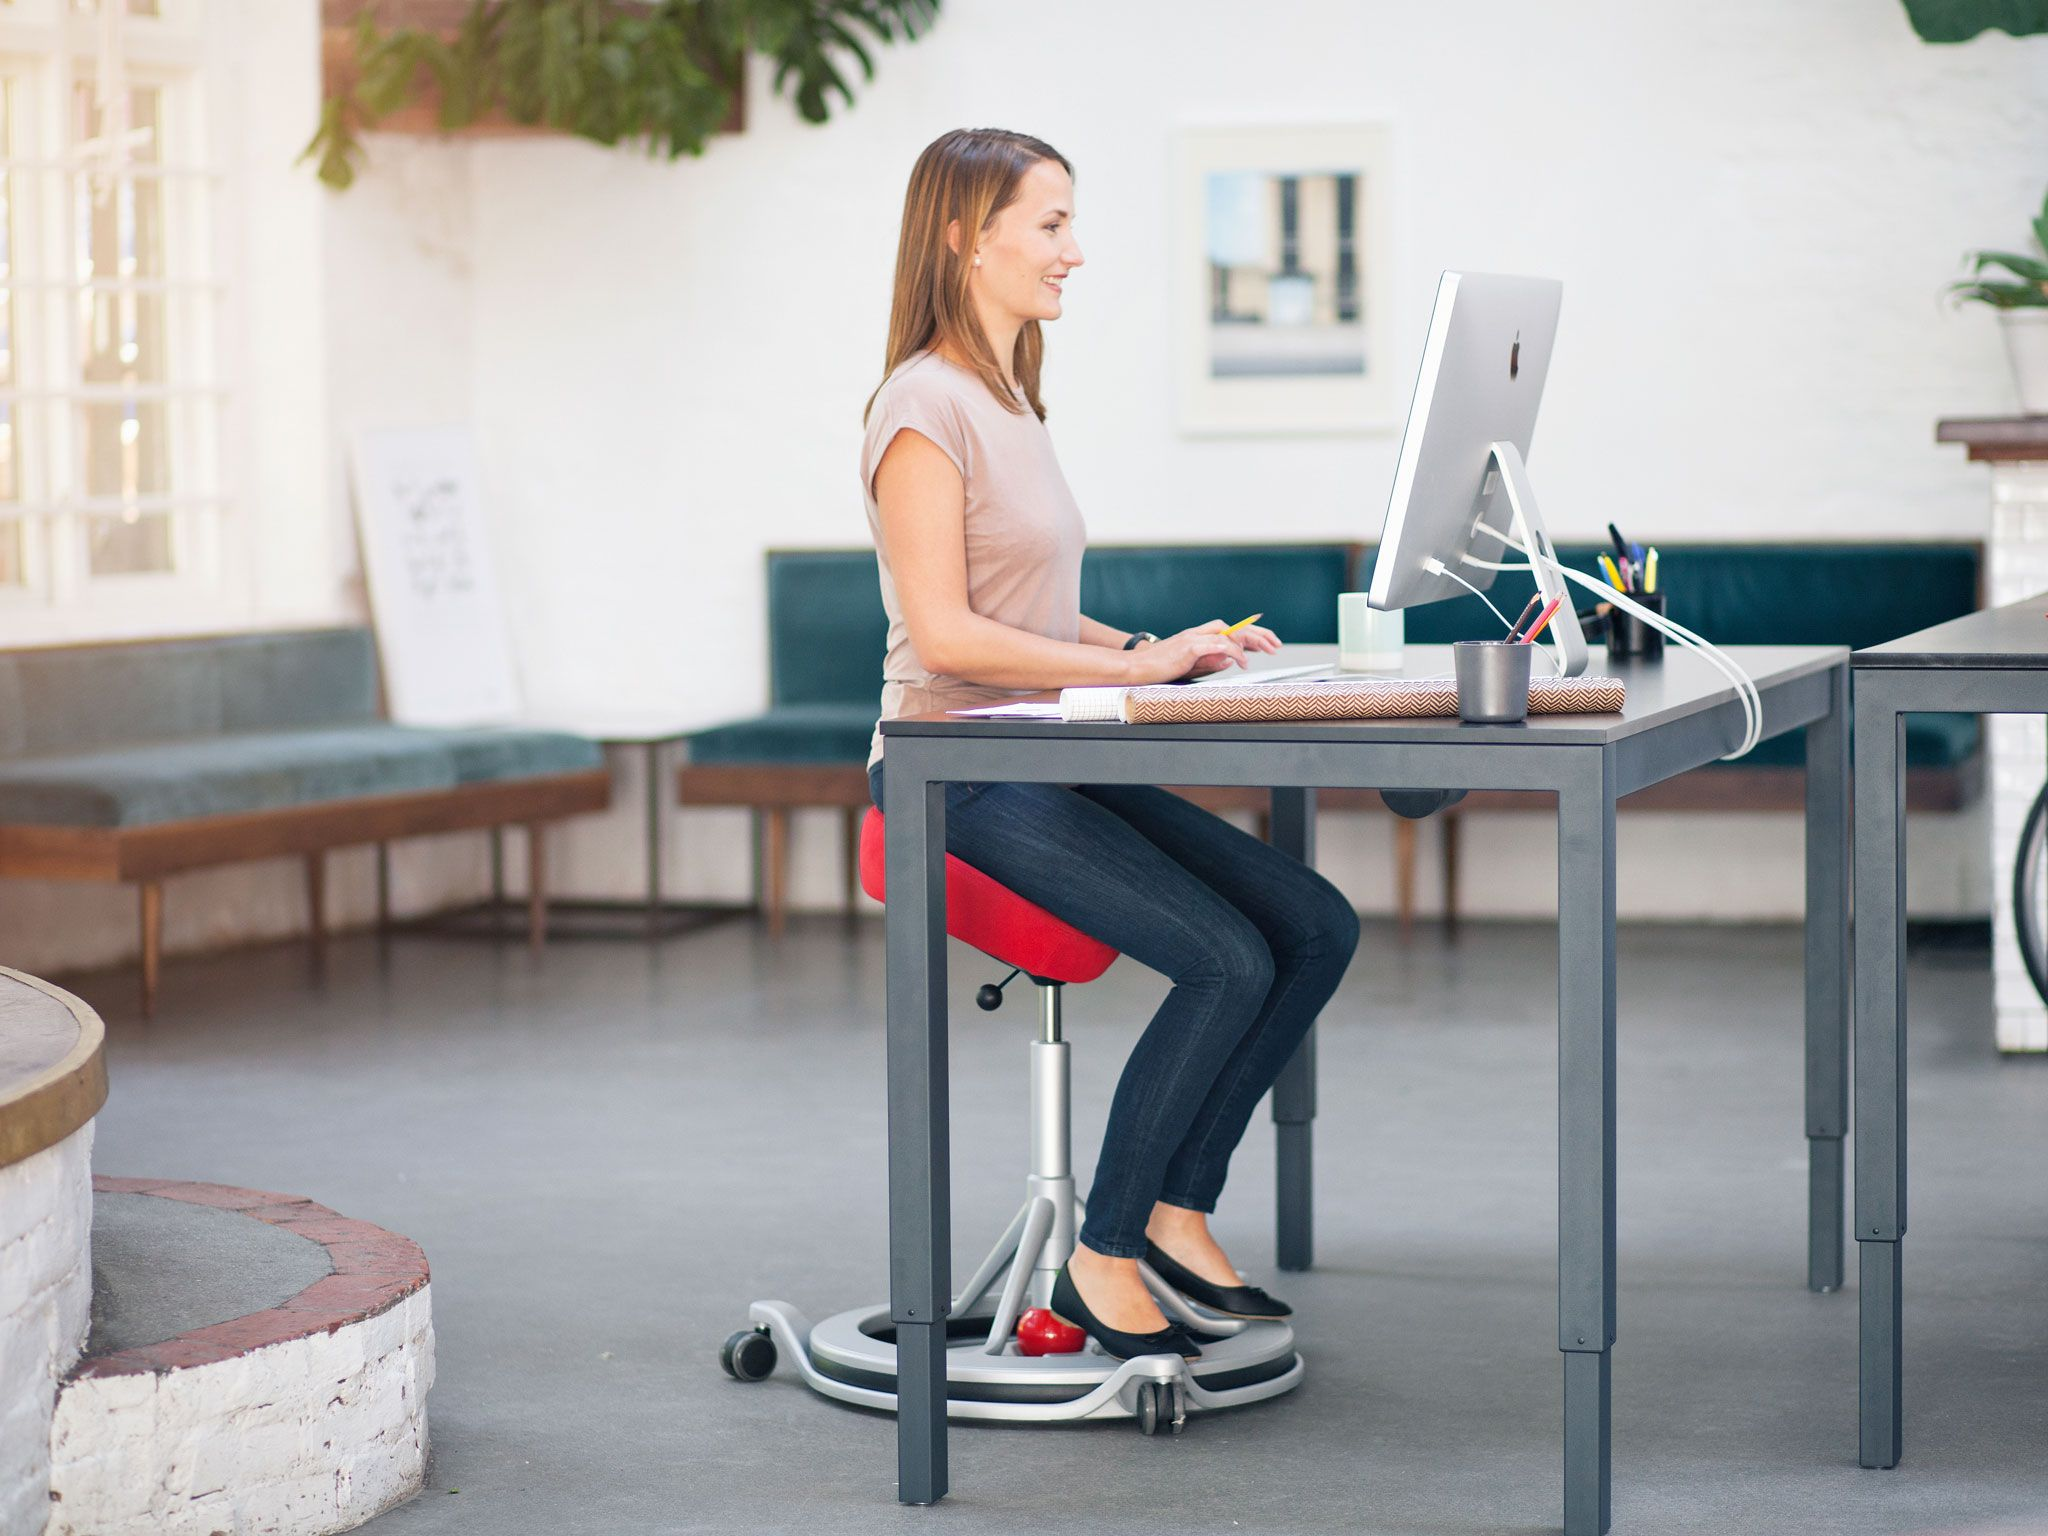 10 Best Desk Exercise Equipment Desk Best Desk Sit Stand Desk